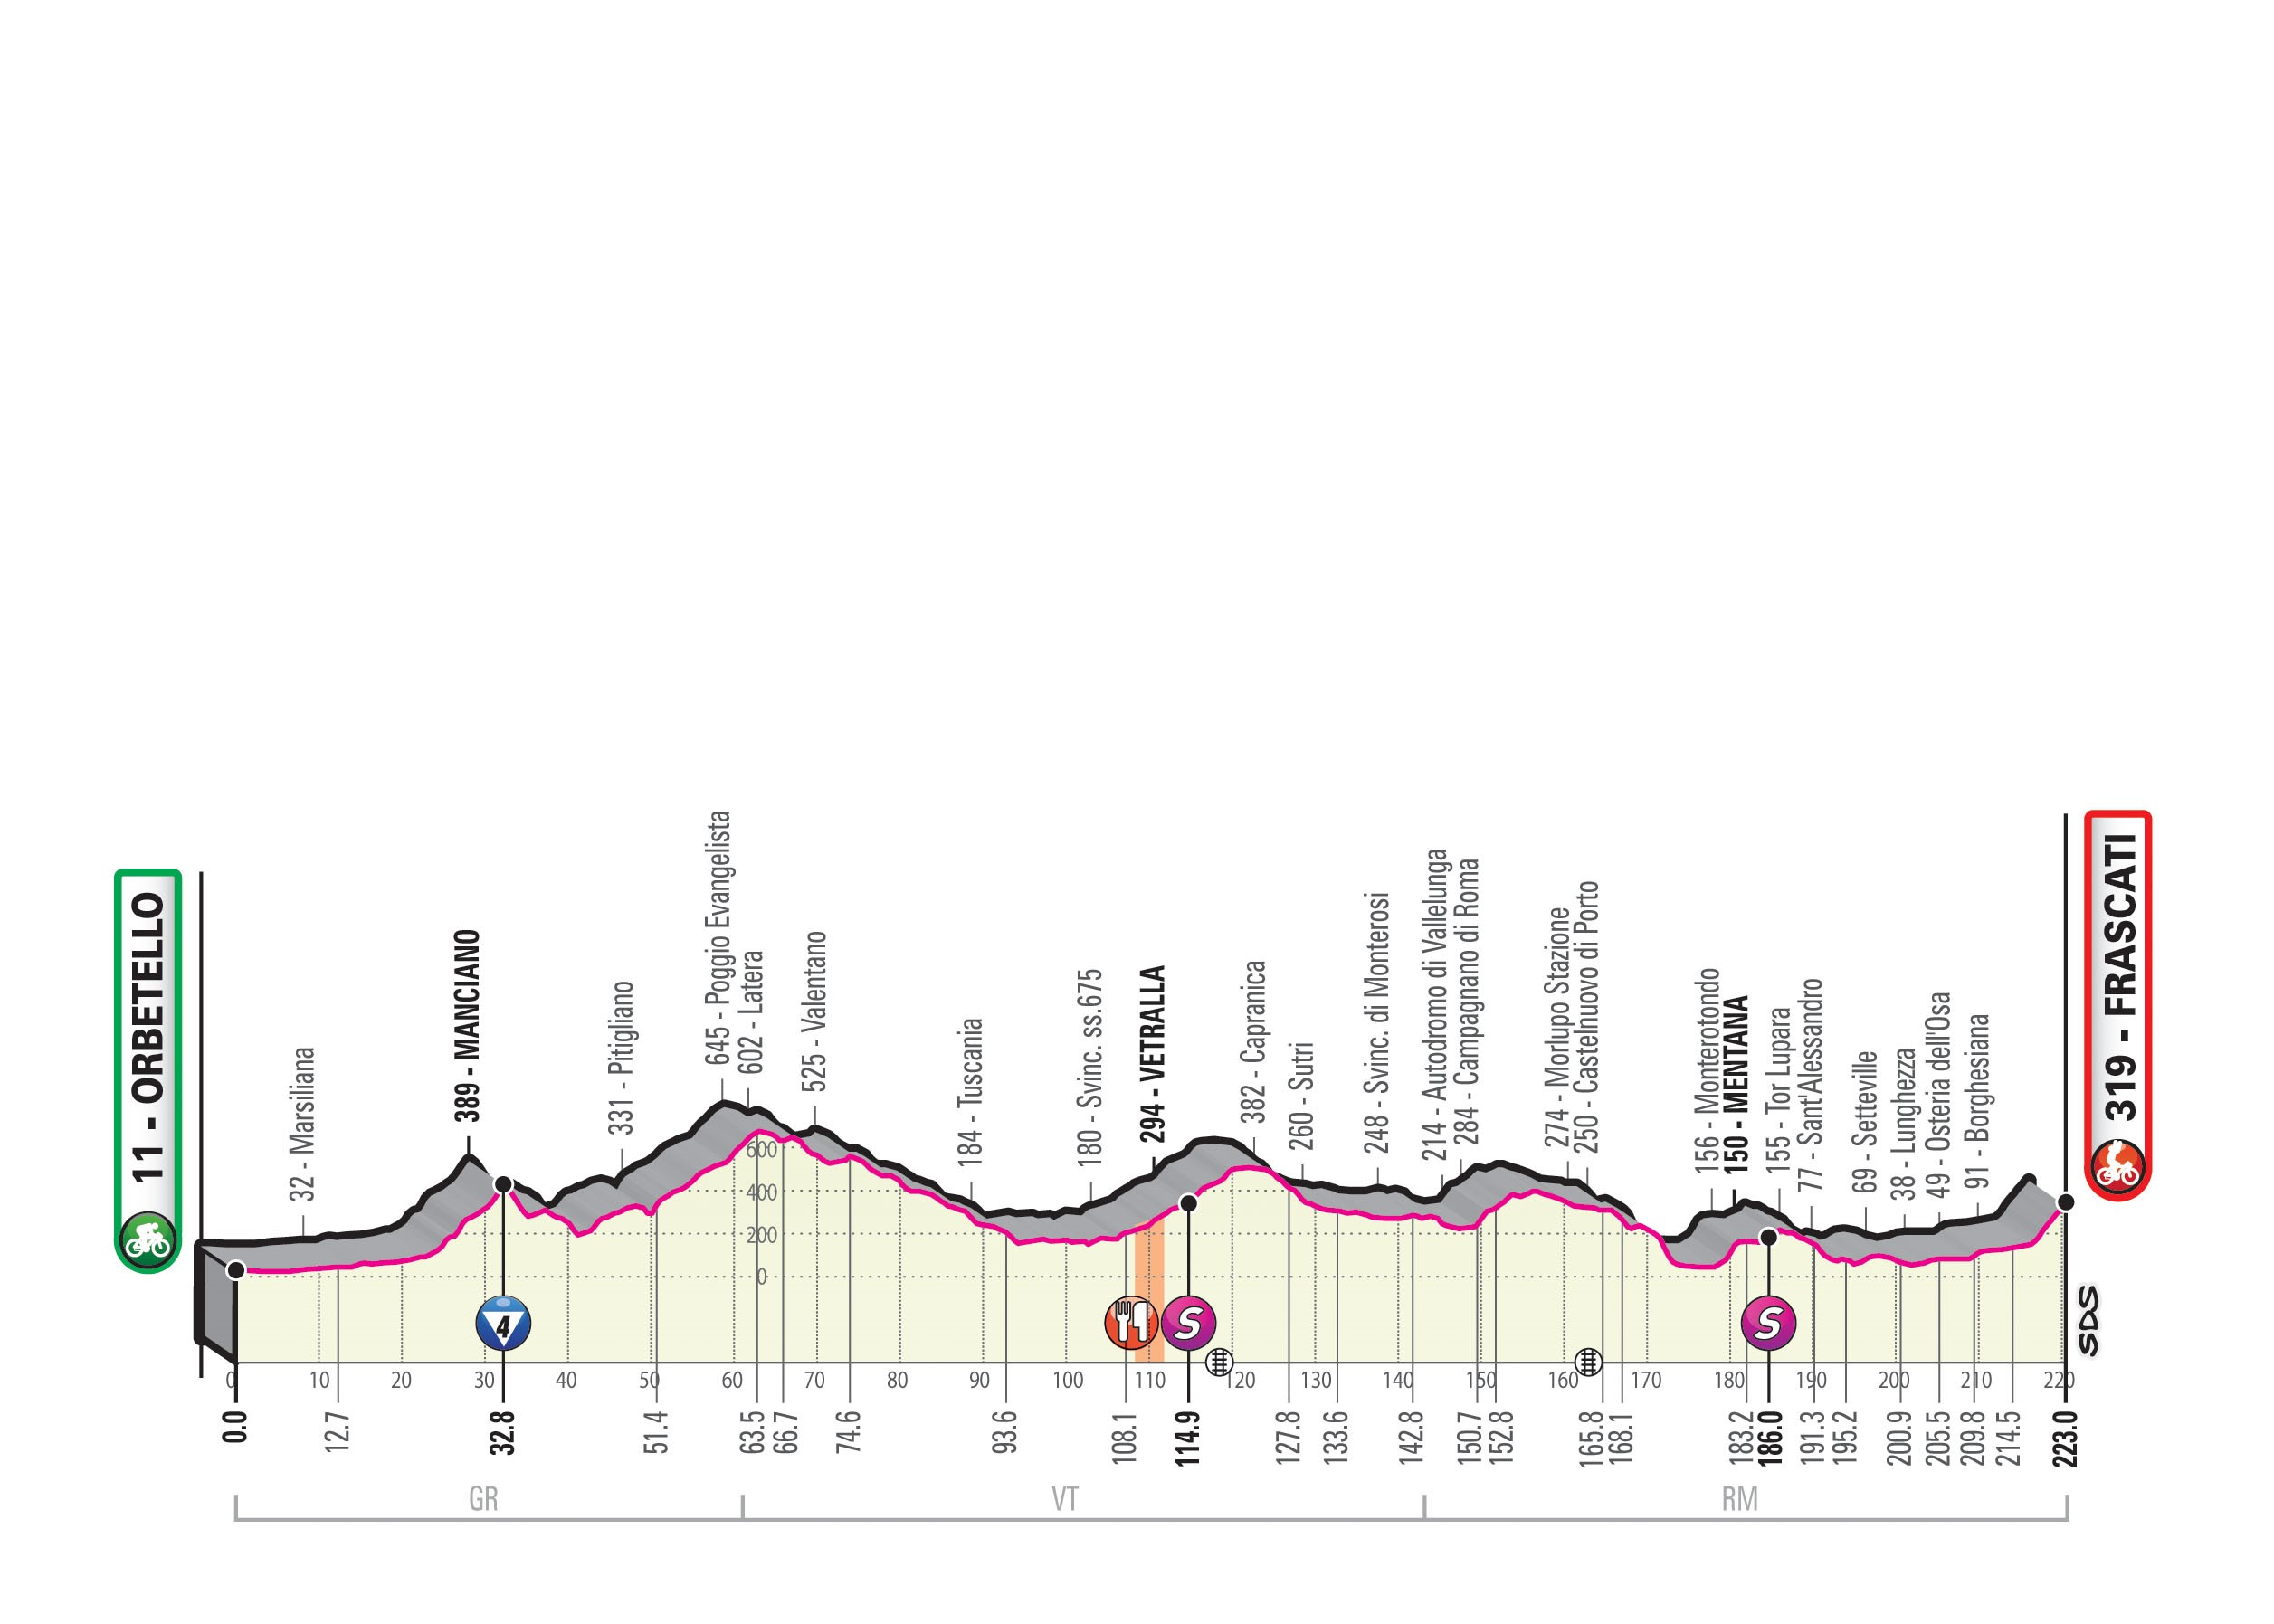 Giro d'Italia - Profil 4. Etappe: Orbetello - Frascati